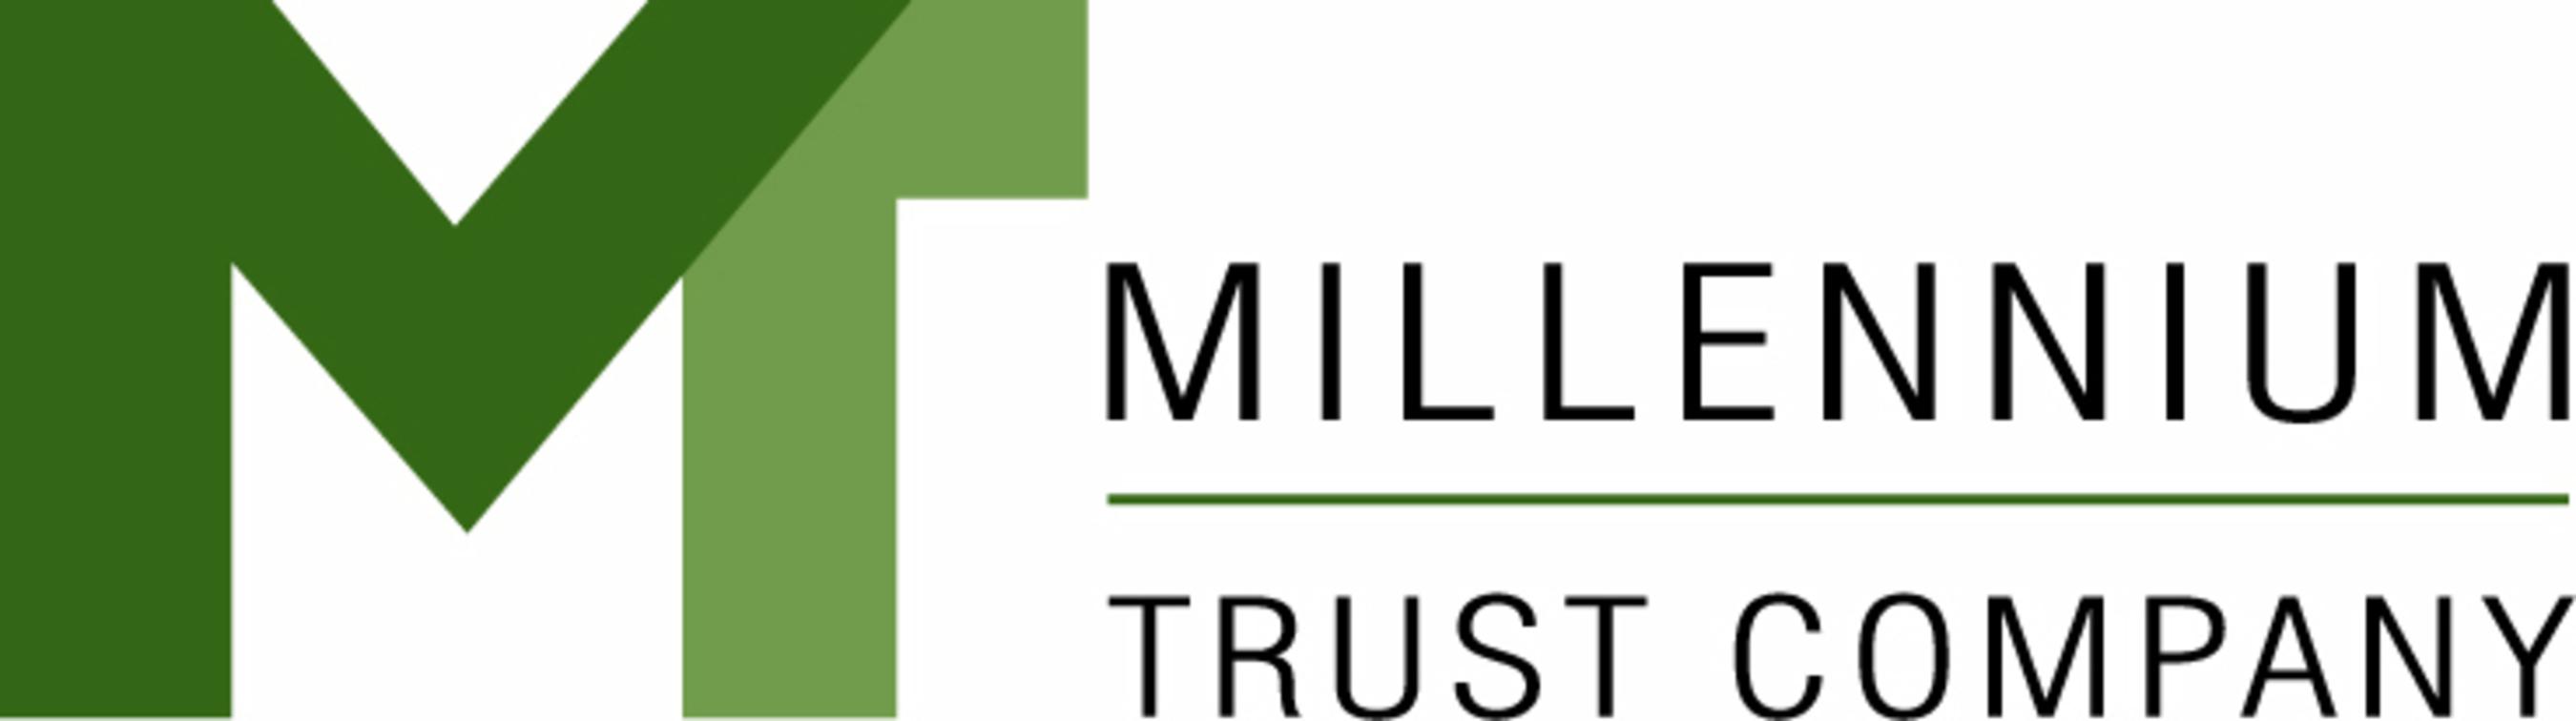 Millennium Trust Company (PRNewsFoto/Millennium Trust Company) (PRNewsFoto/Millennium Trust Company)